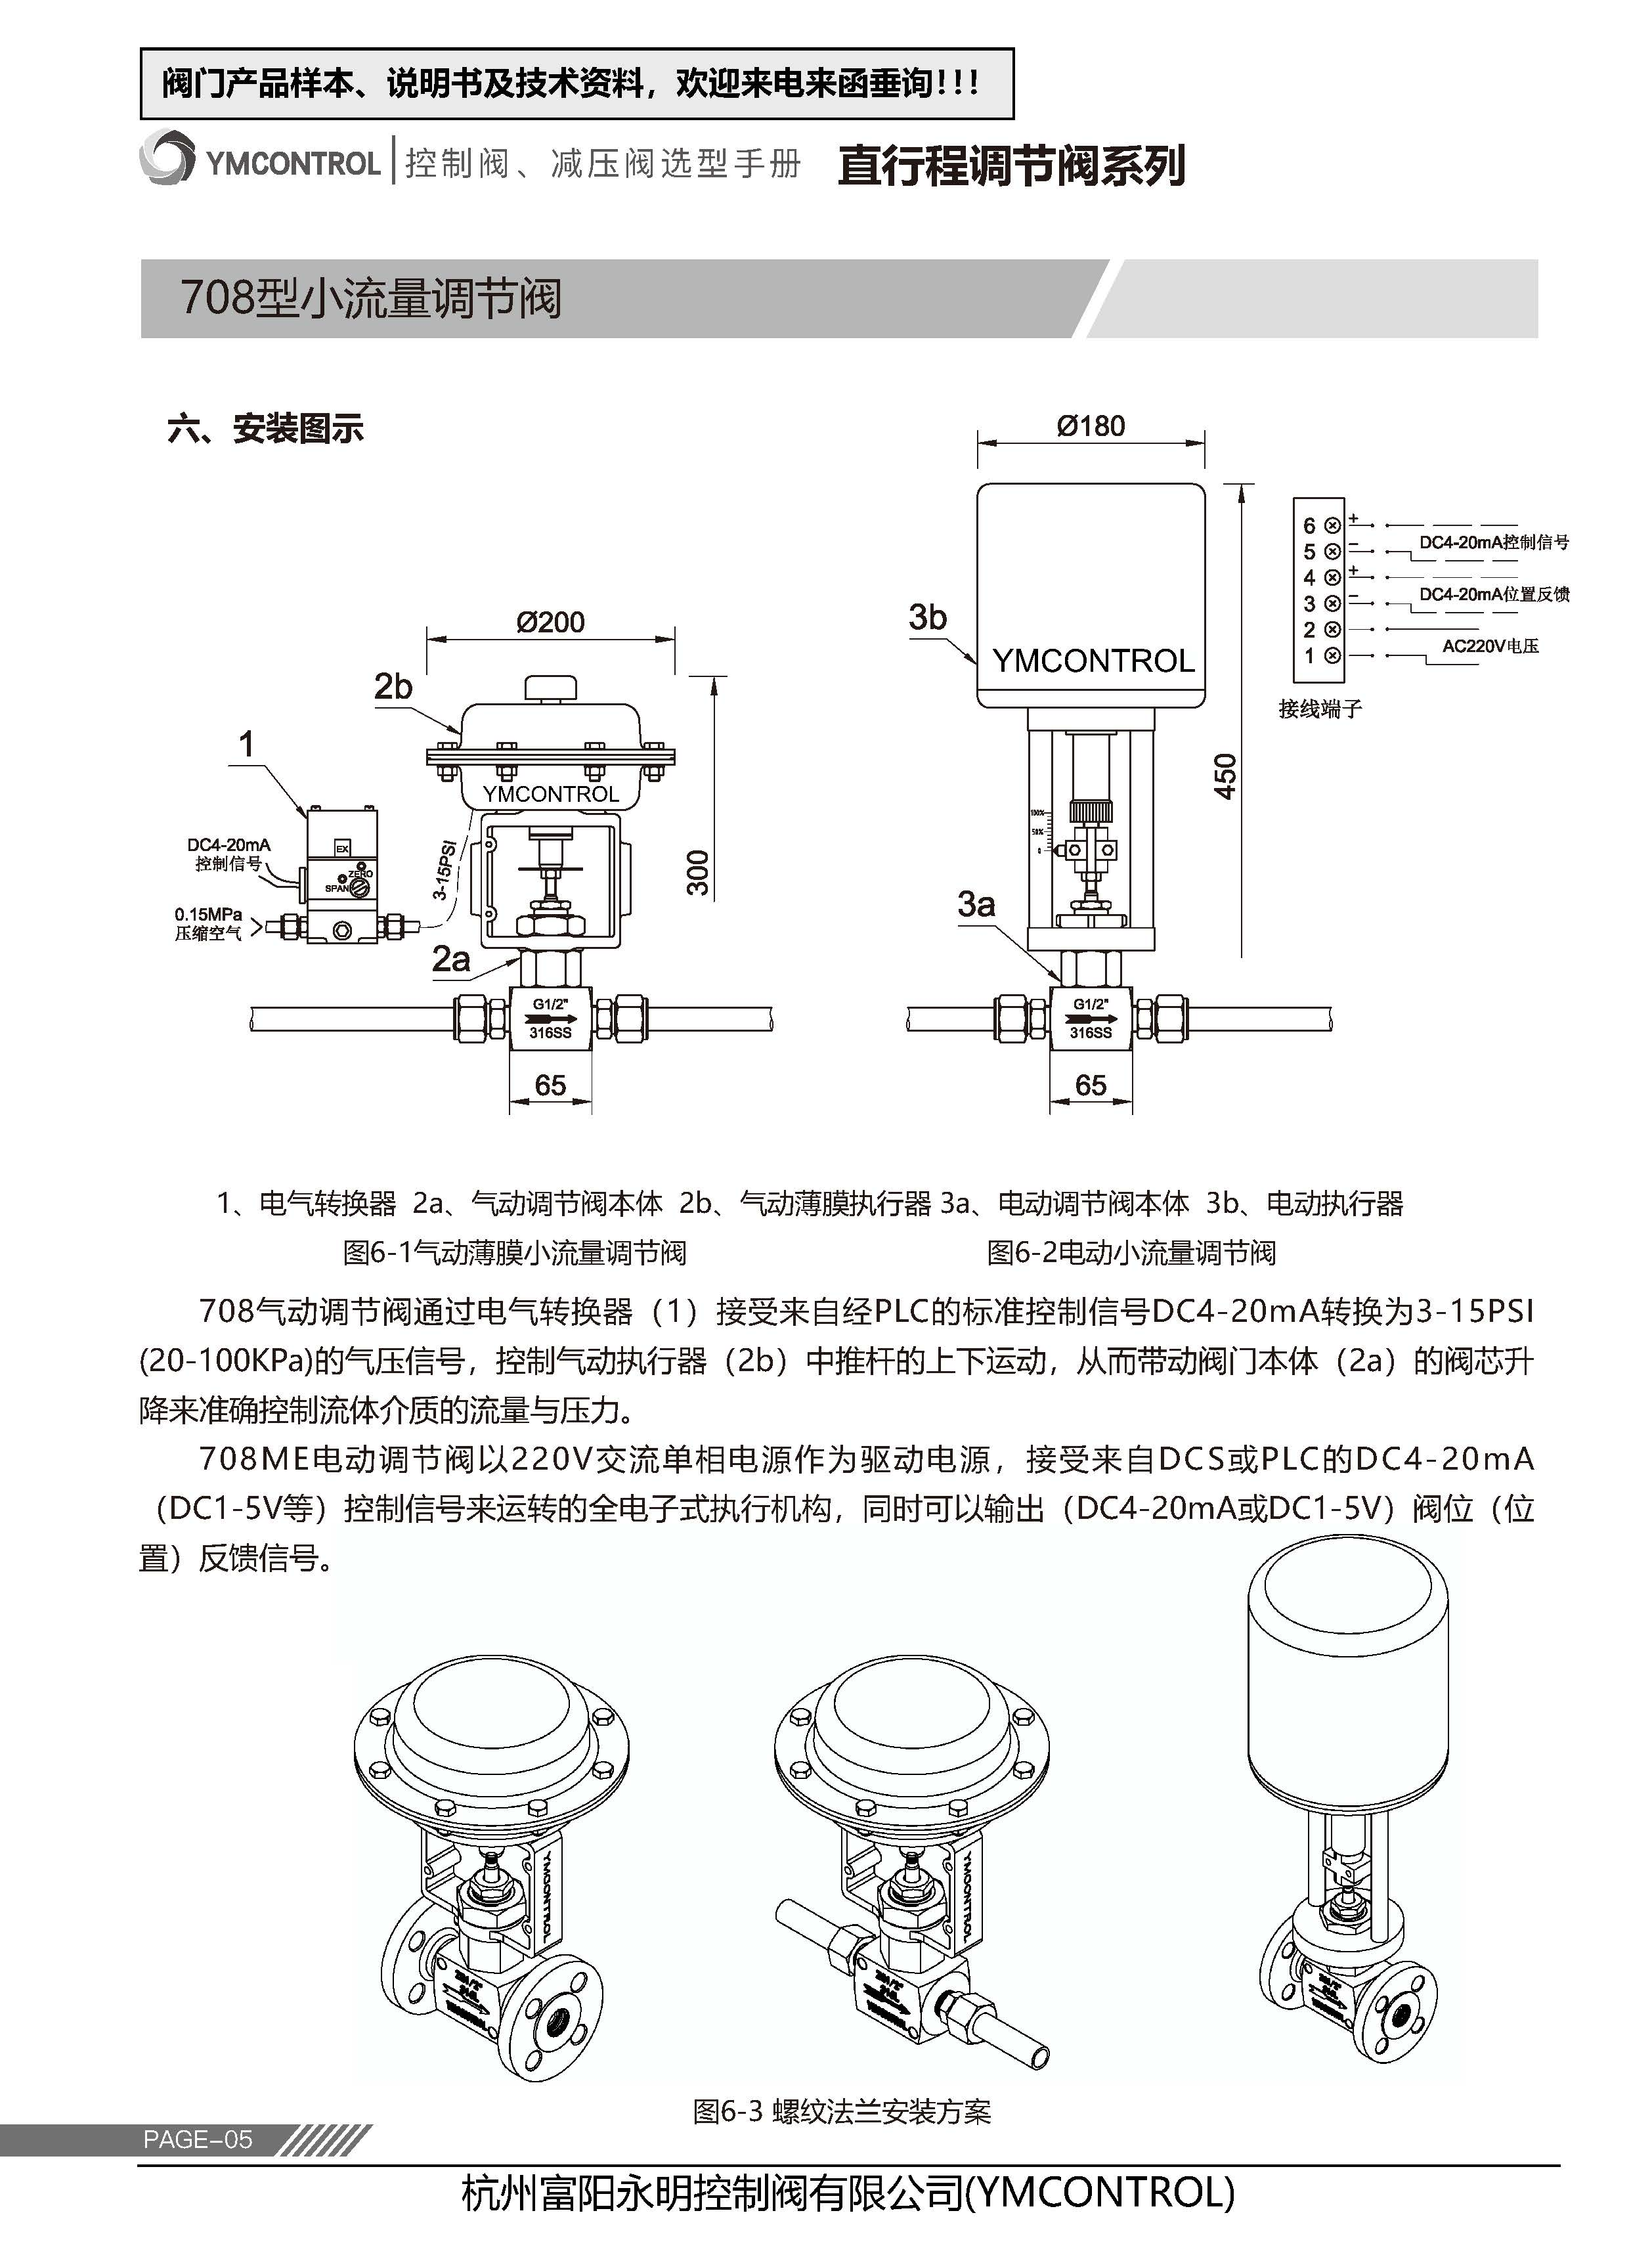 708ME-ZXPE氣動薄膜微小流量調節閥產品樣本說明書